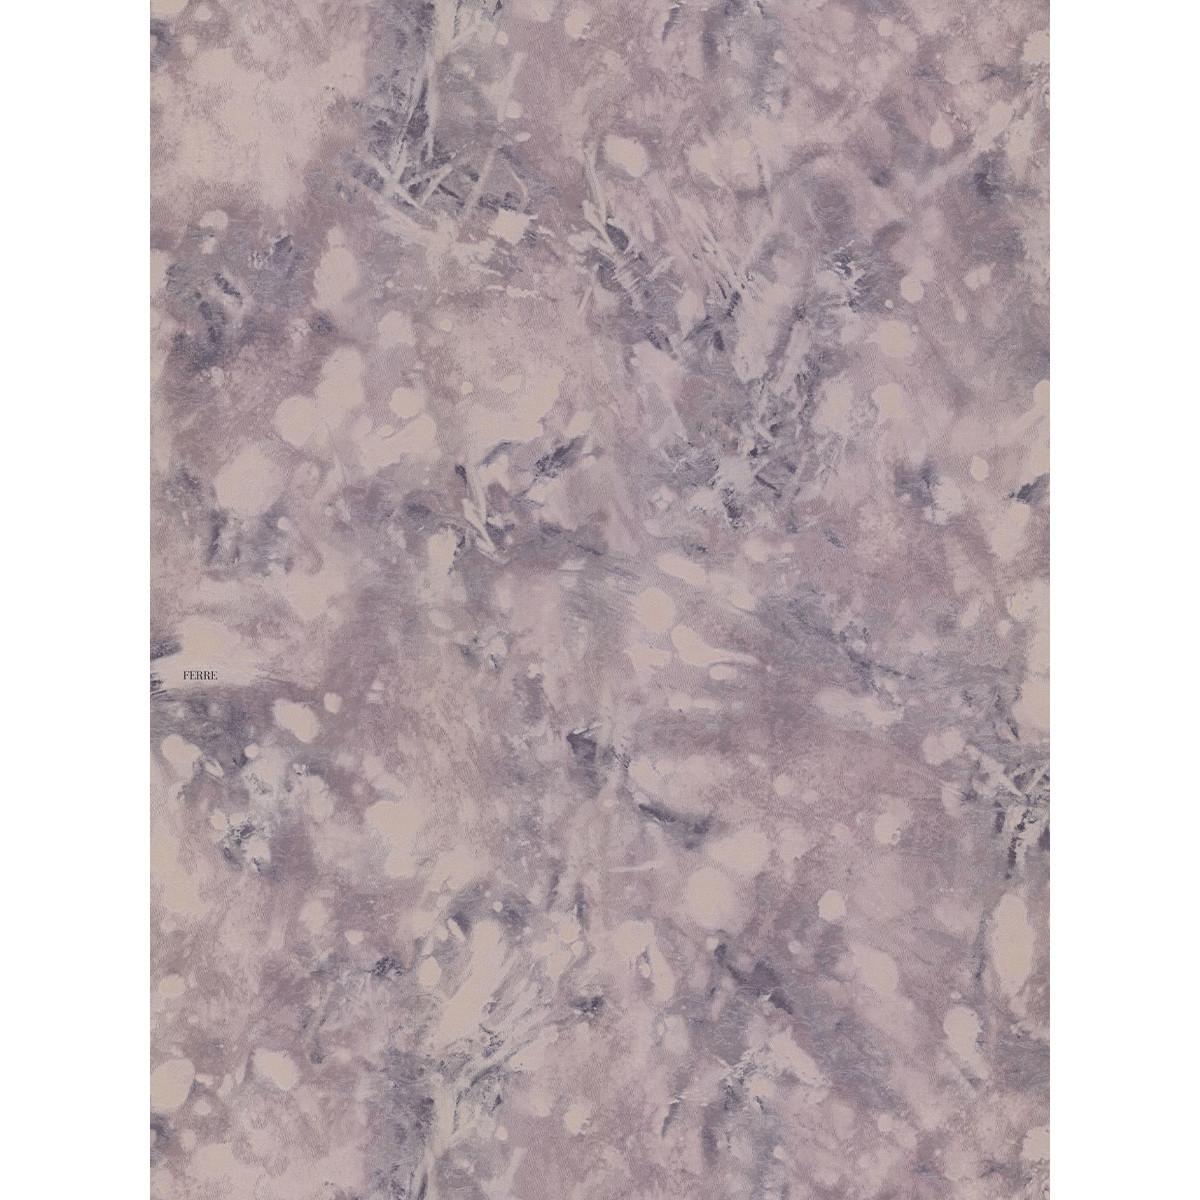 Декоративные обои Gianfranco Ferre Home фиолетовые 61084GF 0.7 м